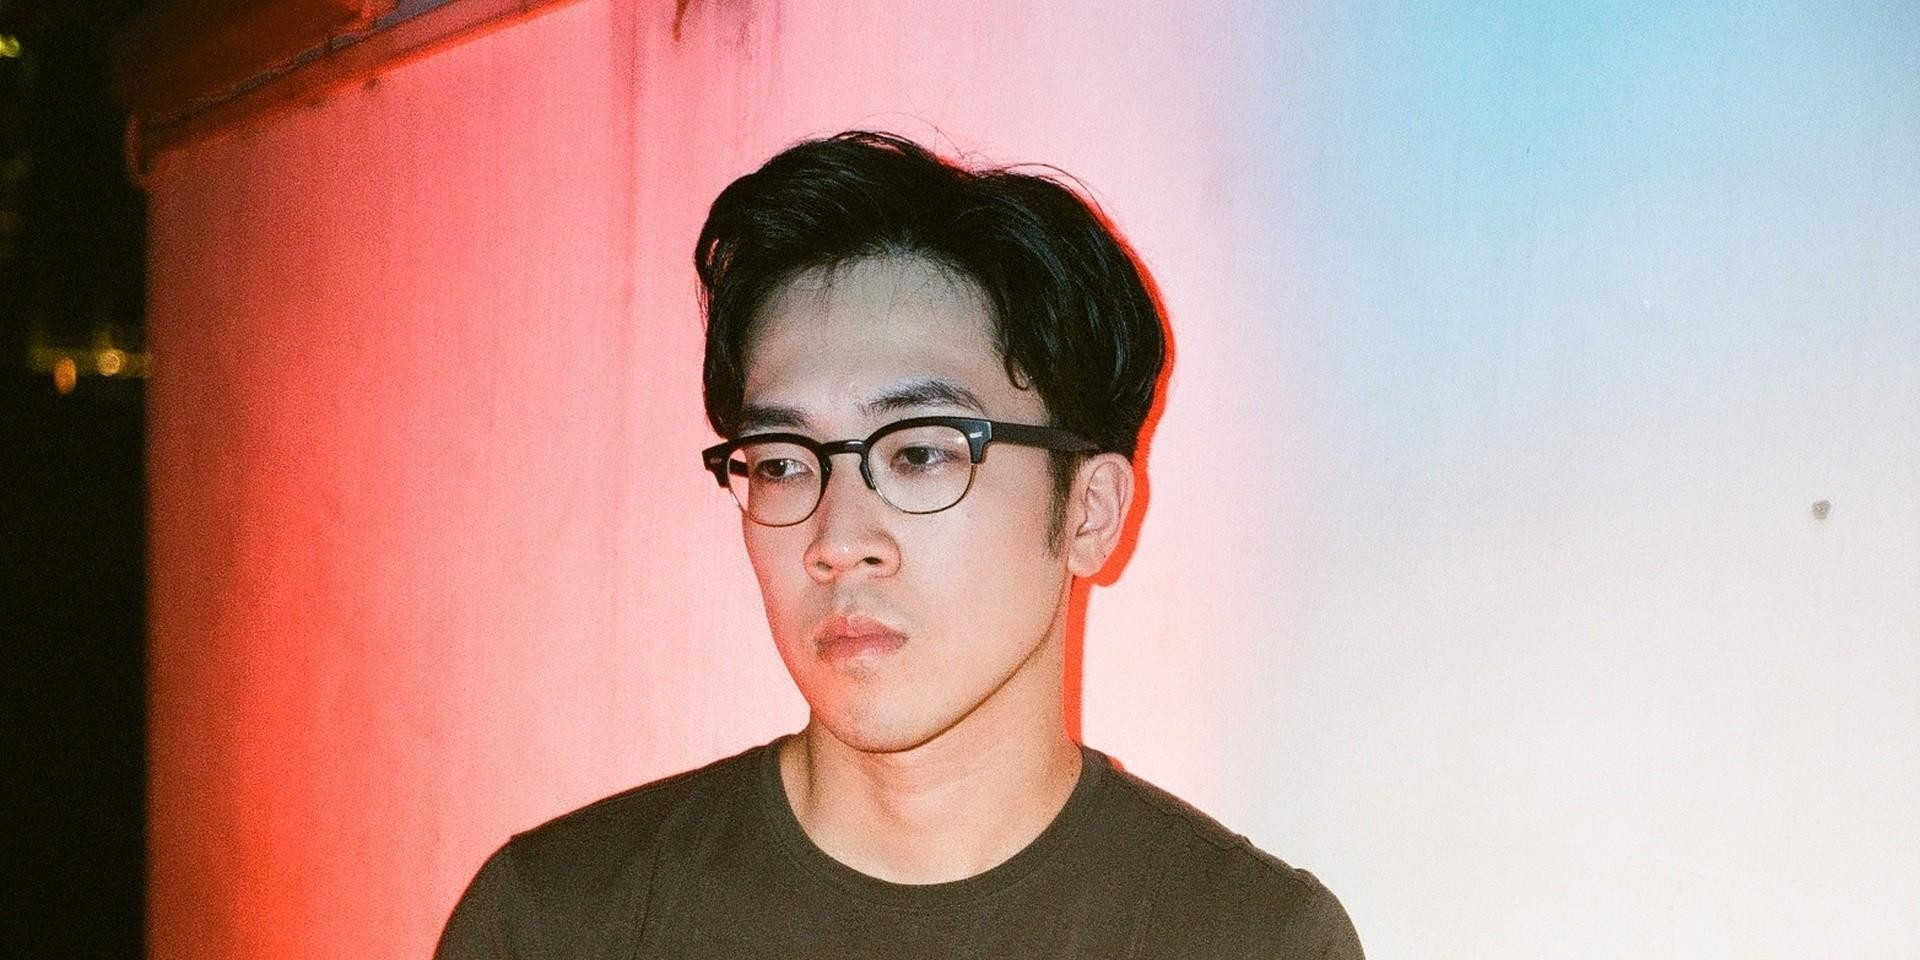 Charlie Lim explores new electronic ground with 'Zero-Sum' – listen